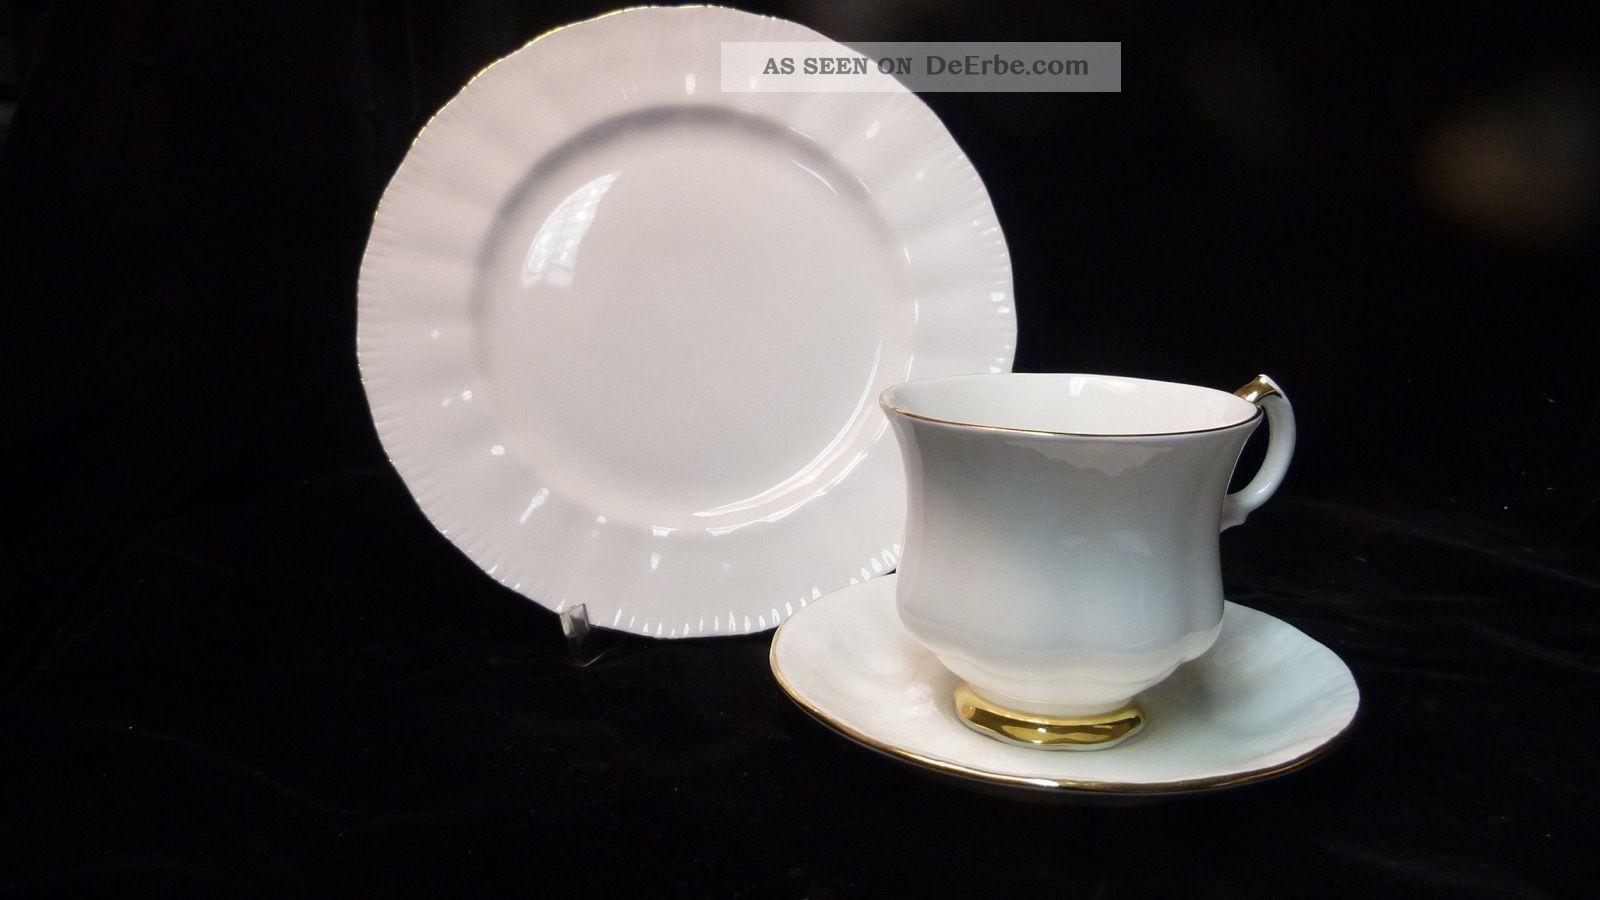 royal knight sammelgedeck bone china porzellan england vintage. Black Bedroom Furniture Sets. Home Design Ideas